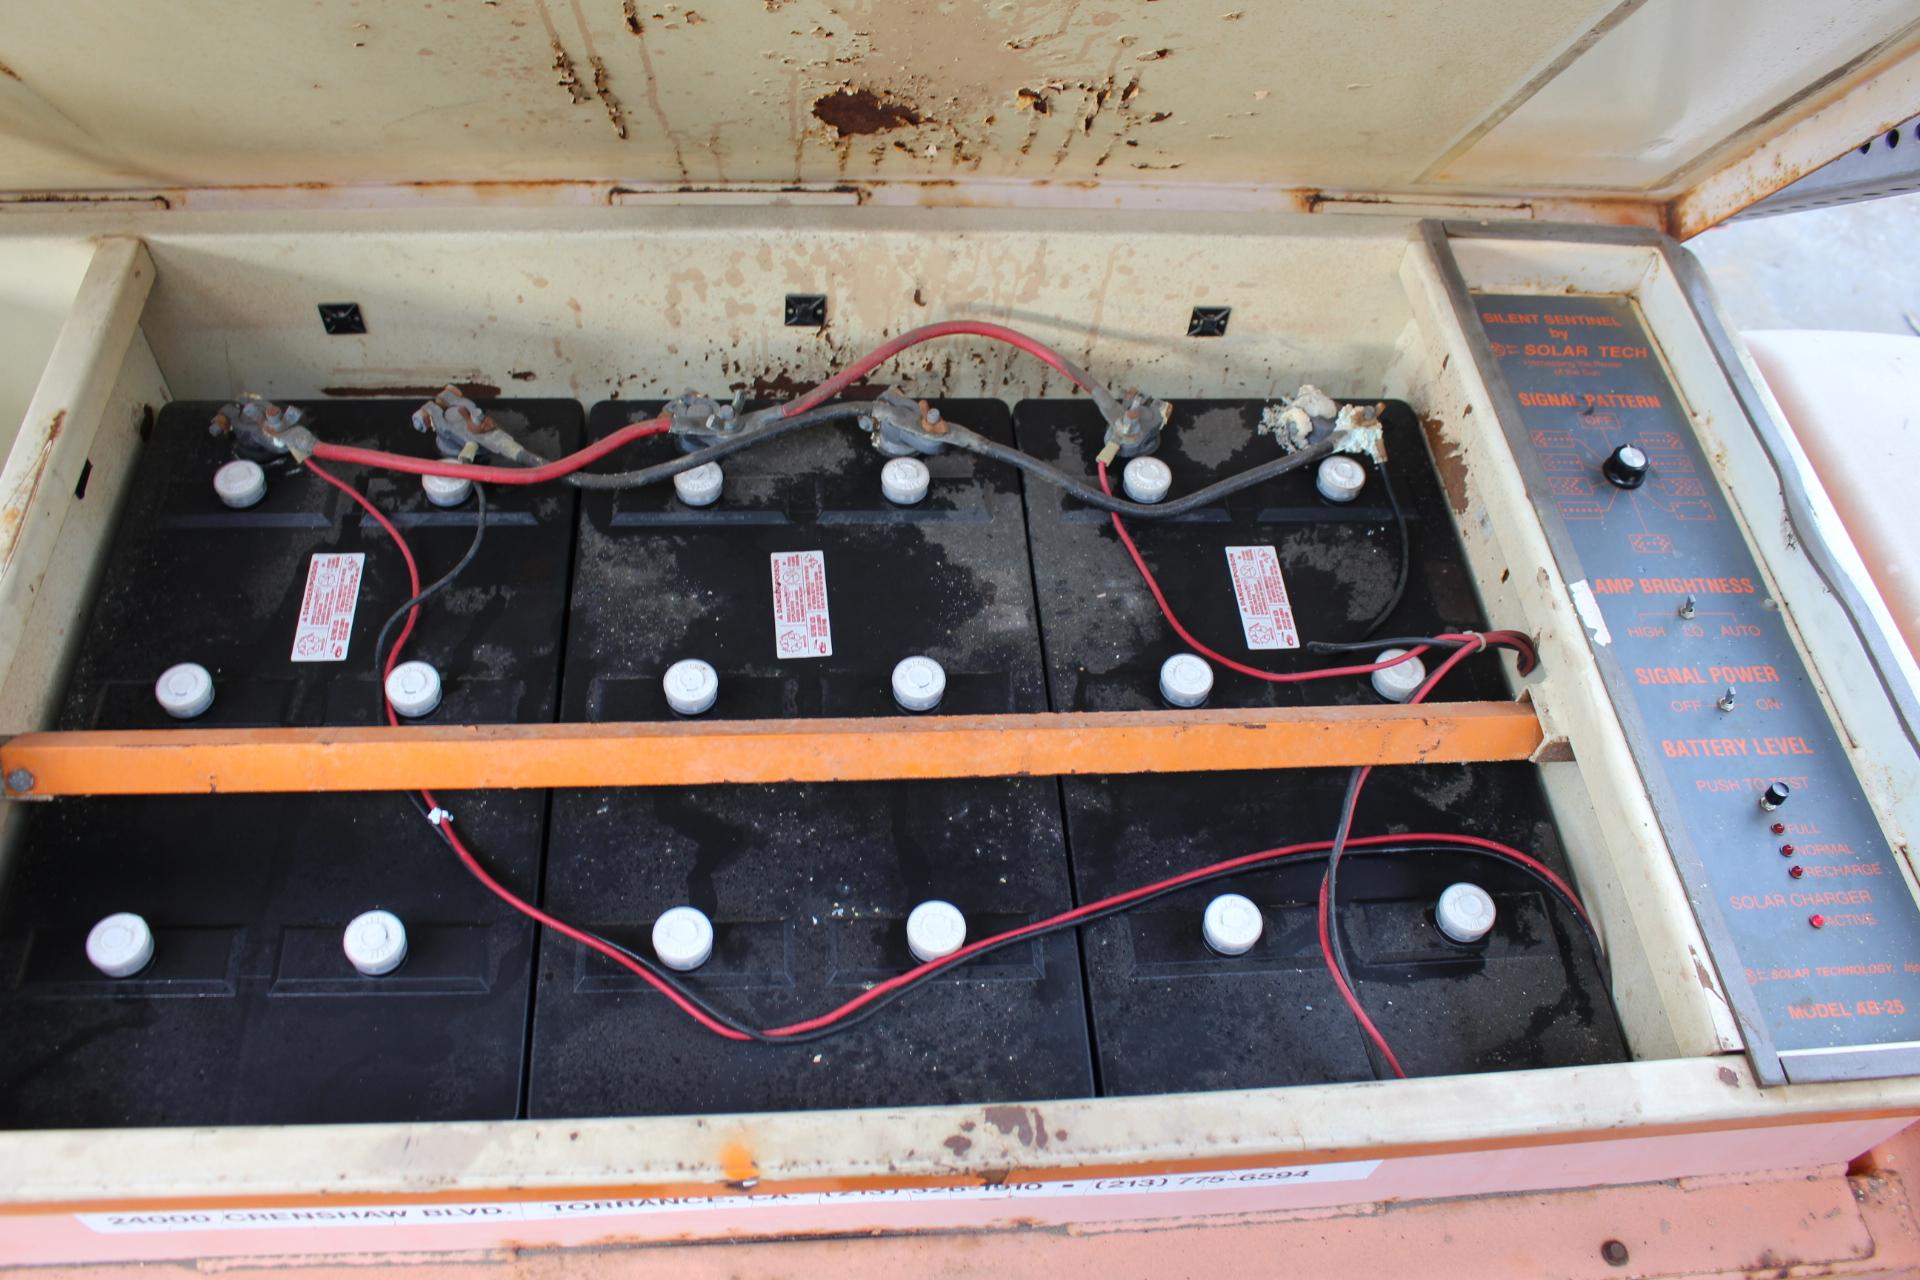 Lot 46 - SOLAR TRAFFIC CONTROL SIGN ON TRAILER, W/ BATTERIES